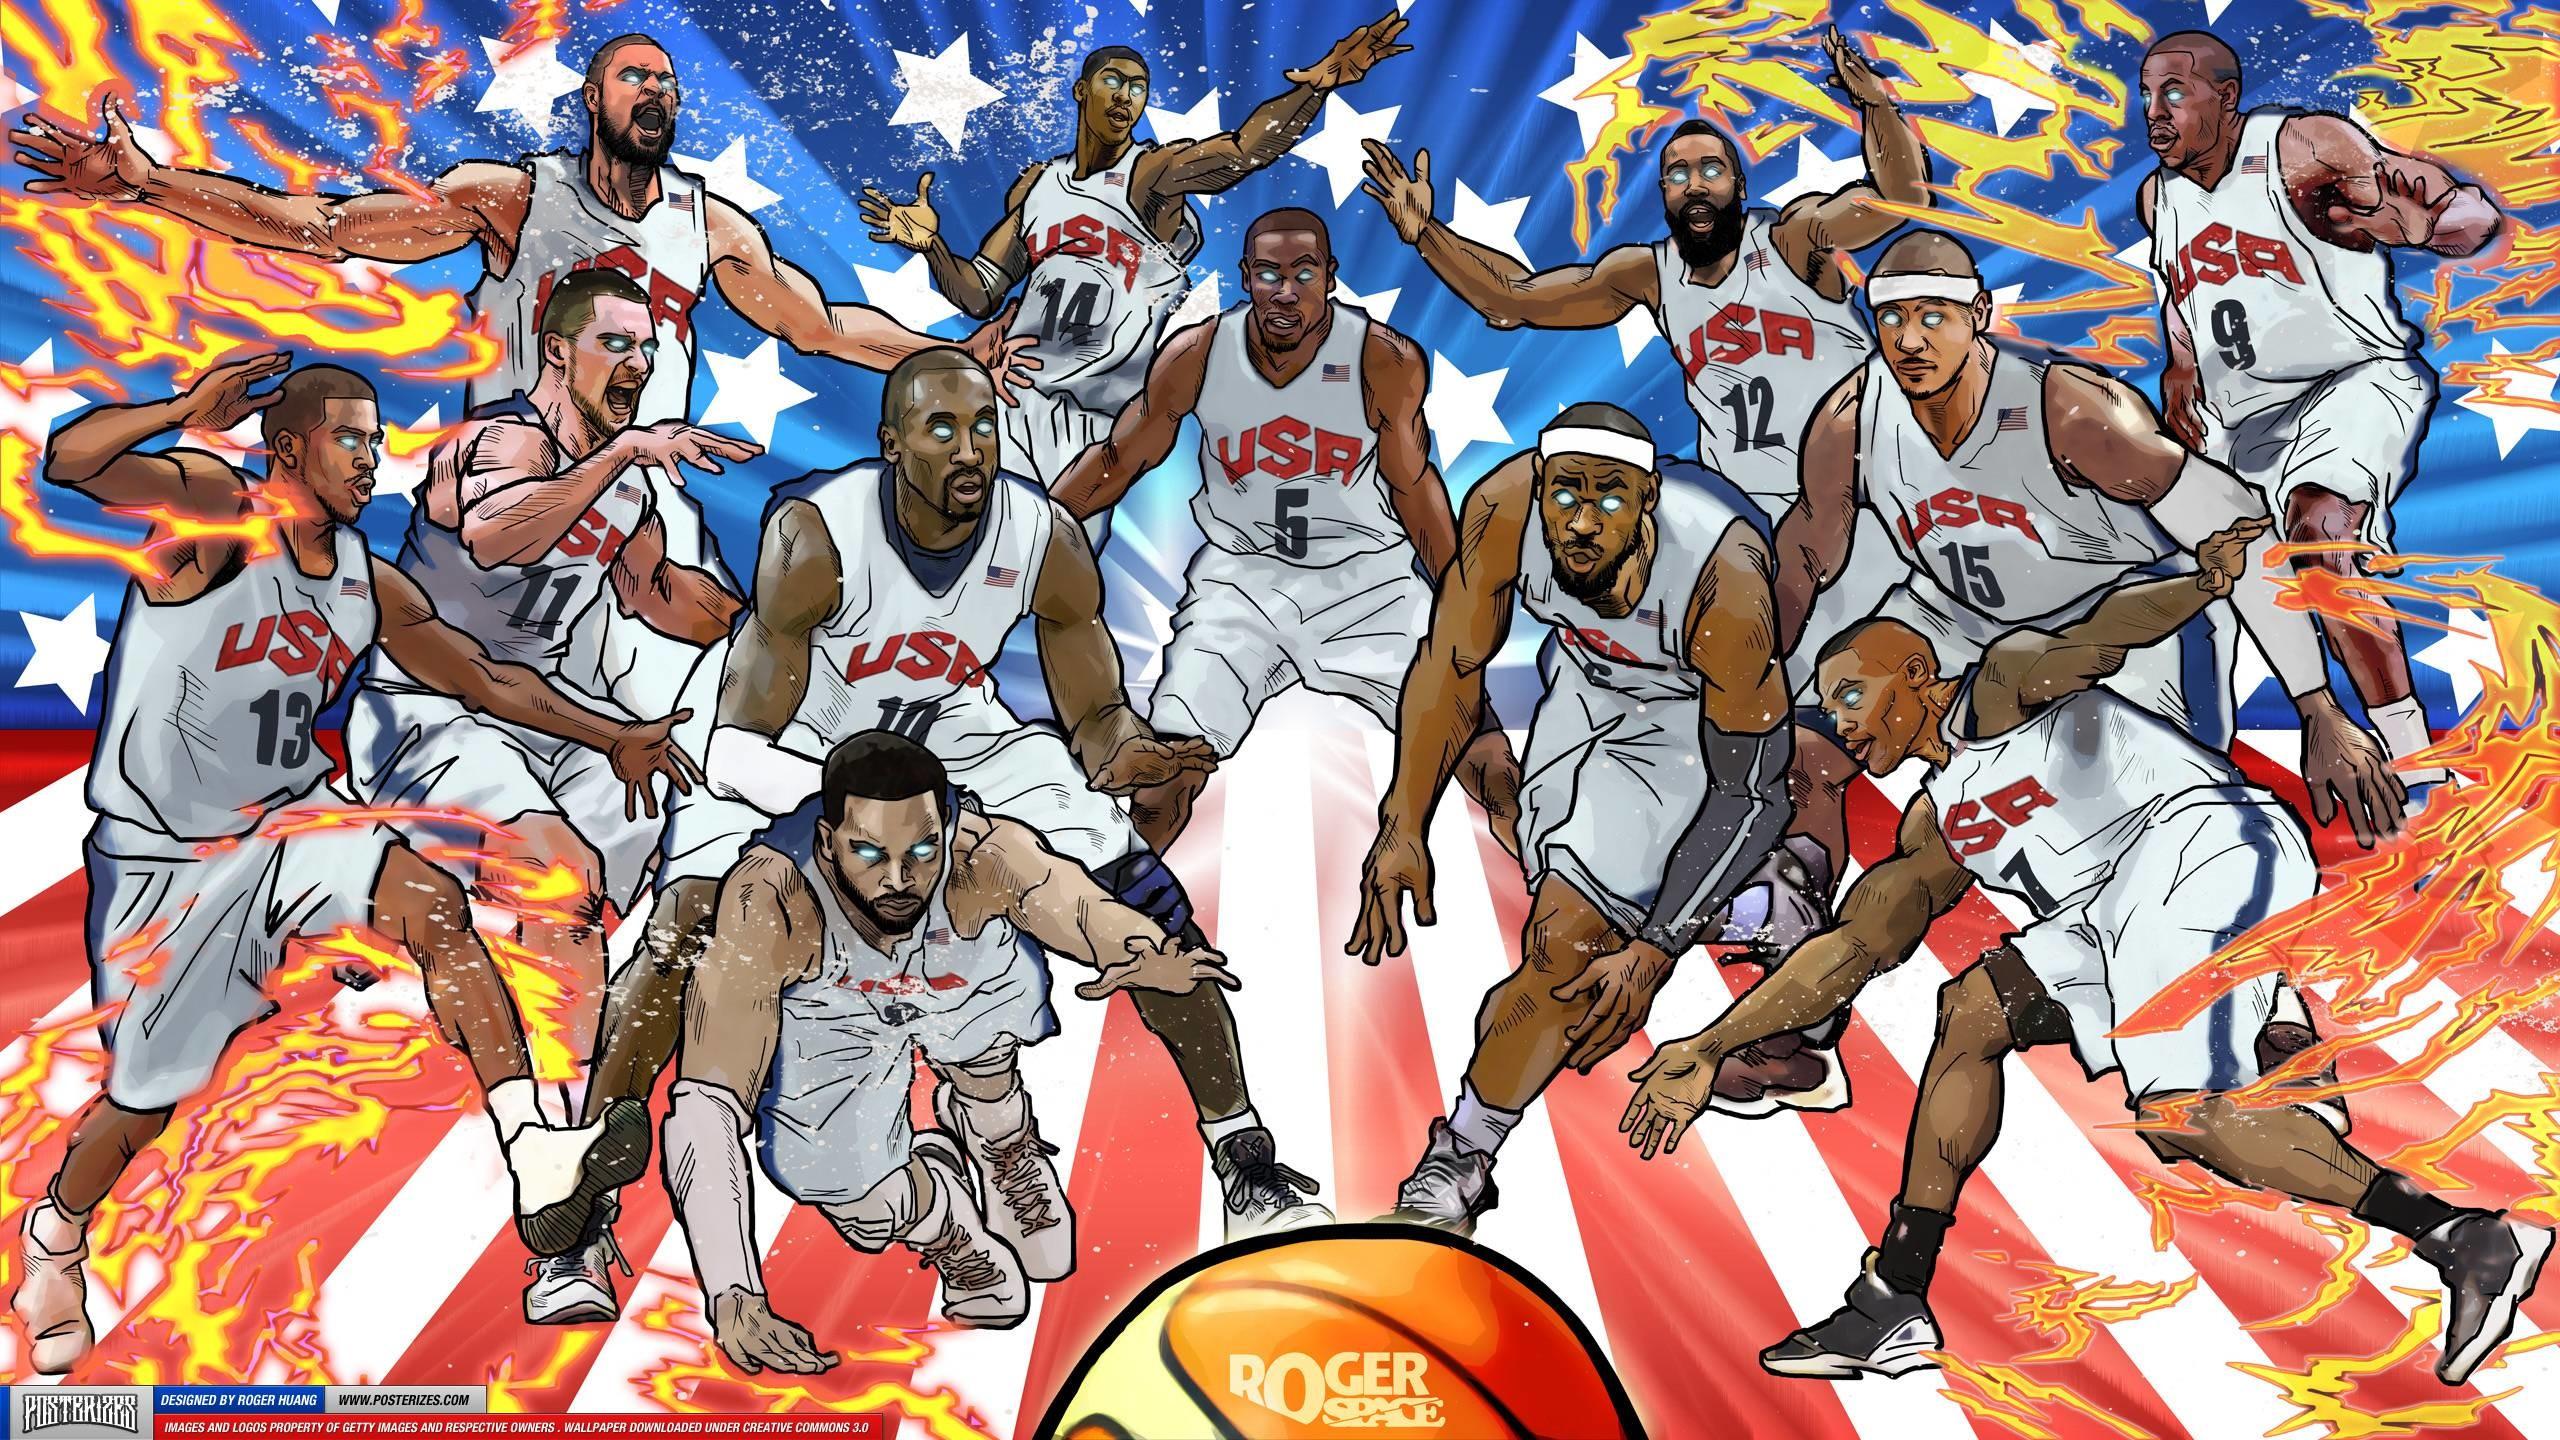 Nba Basketball Wallpapers 2015 – Wallpaper Cave